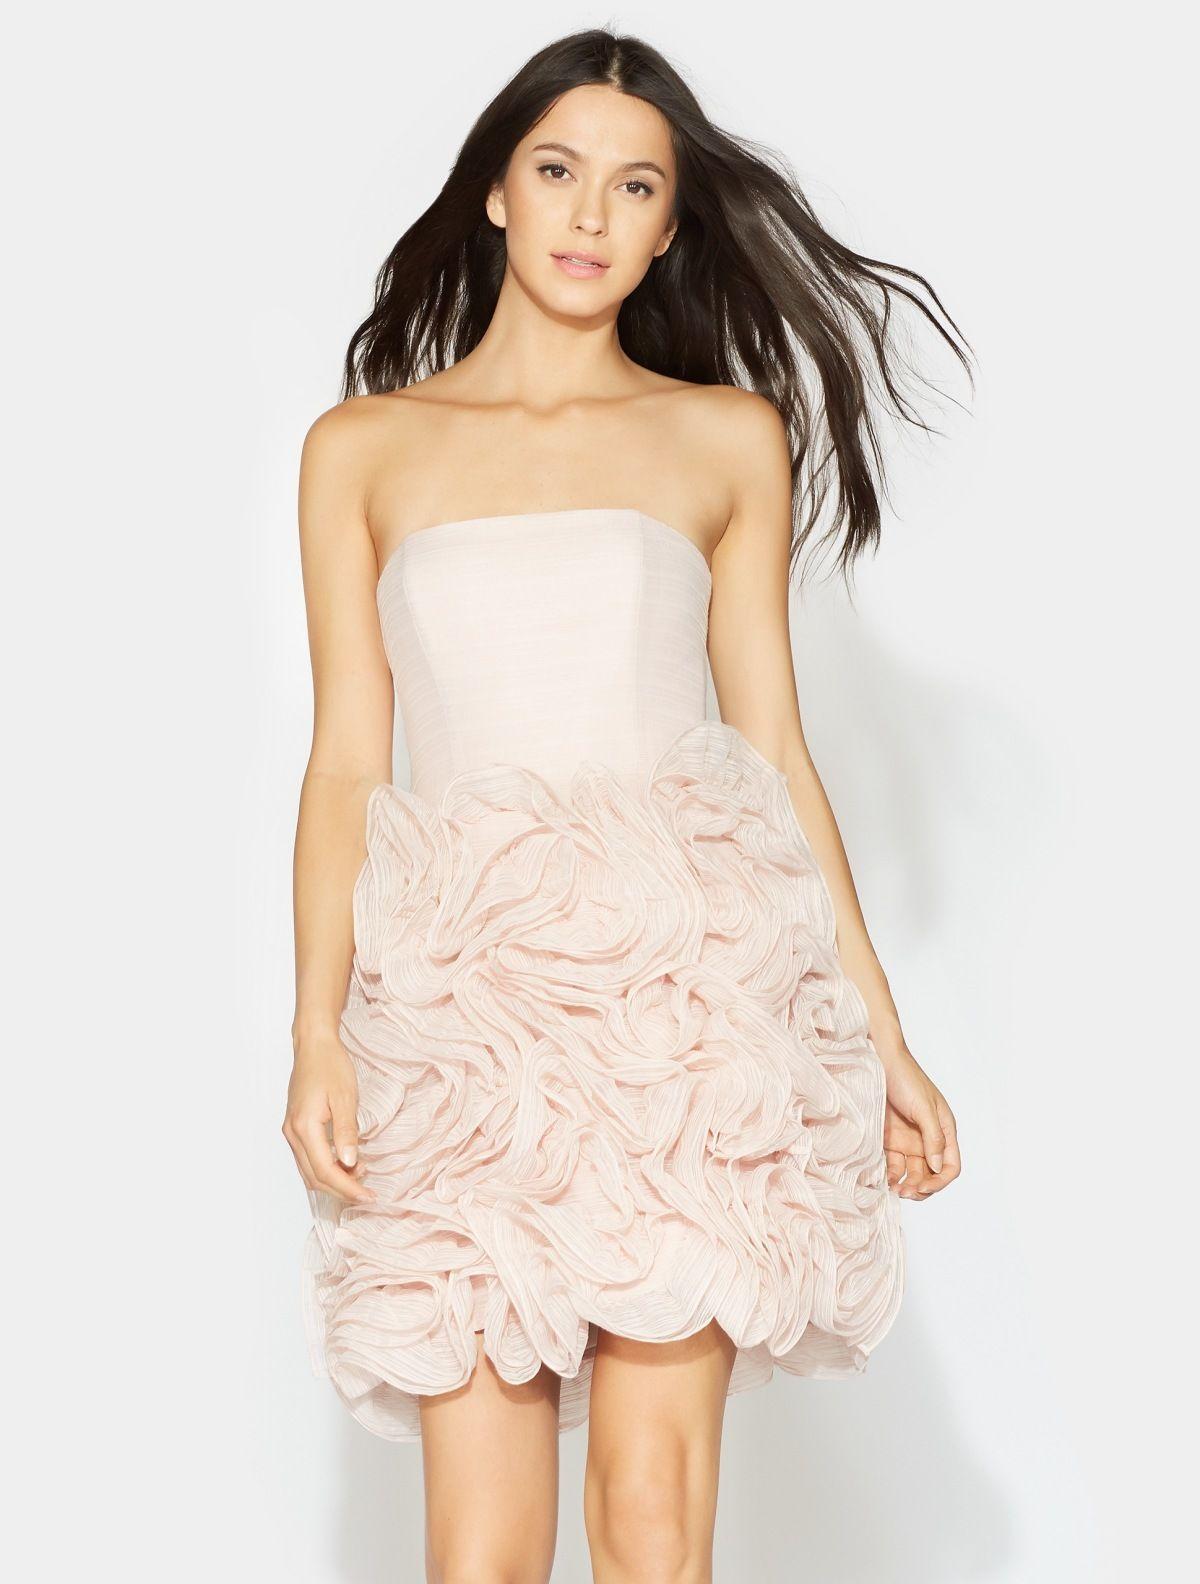 Halston Strapless Ruffle Dress Strapless Ruffle Dress Prom Party Dresses Short Wedding Dress [ 1584 x 1200 Pixel ]